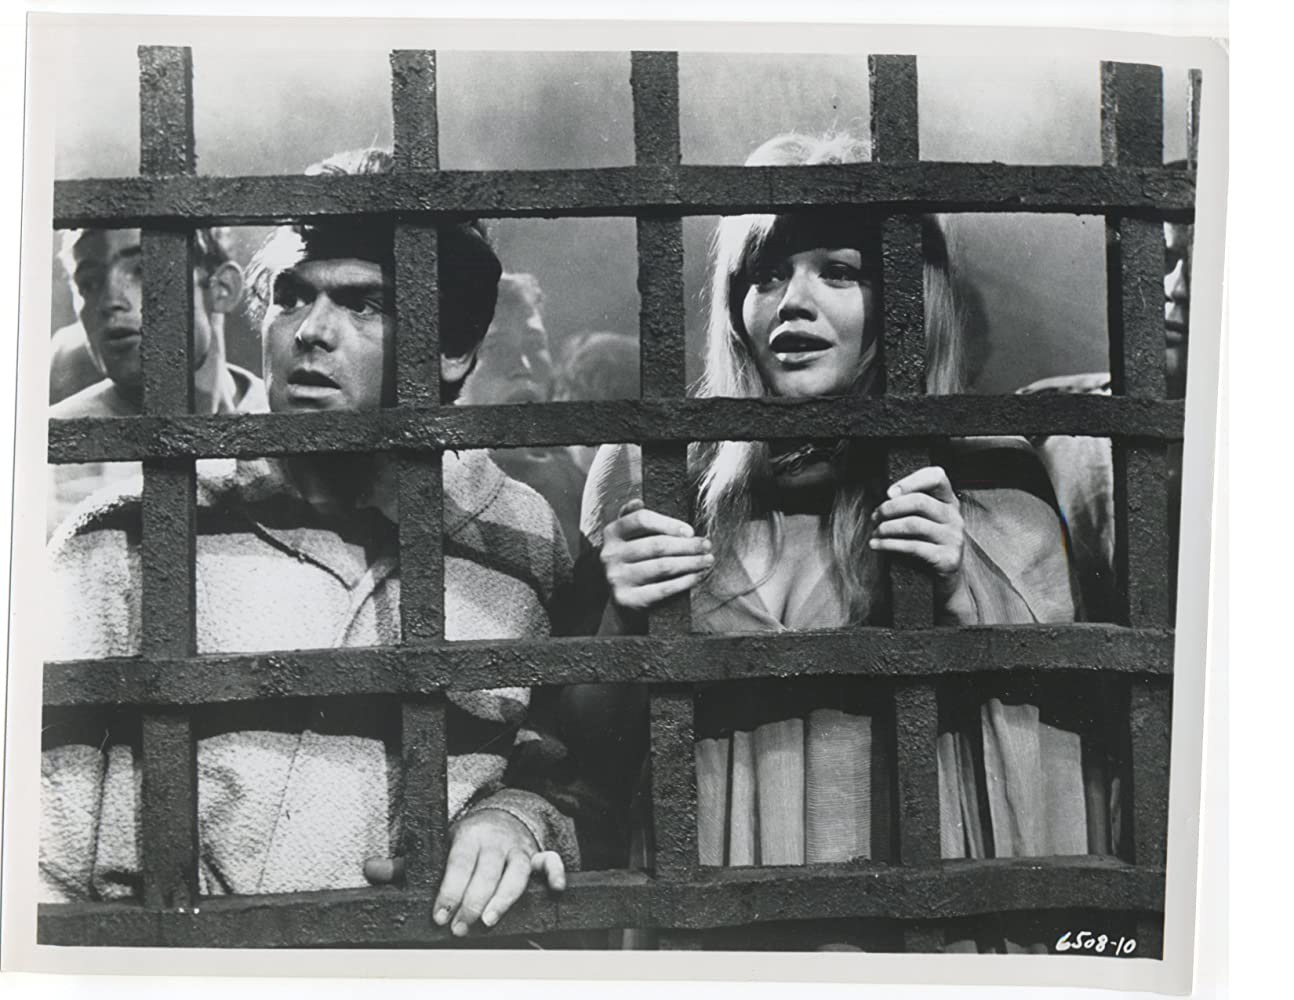 Jennifer Bain,Koharu Kusumi Adult photo Vanessa Brown,Gladys Reyes (b. 1978)